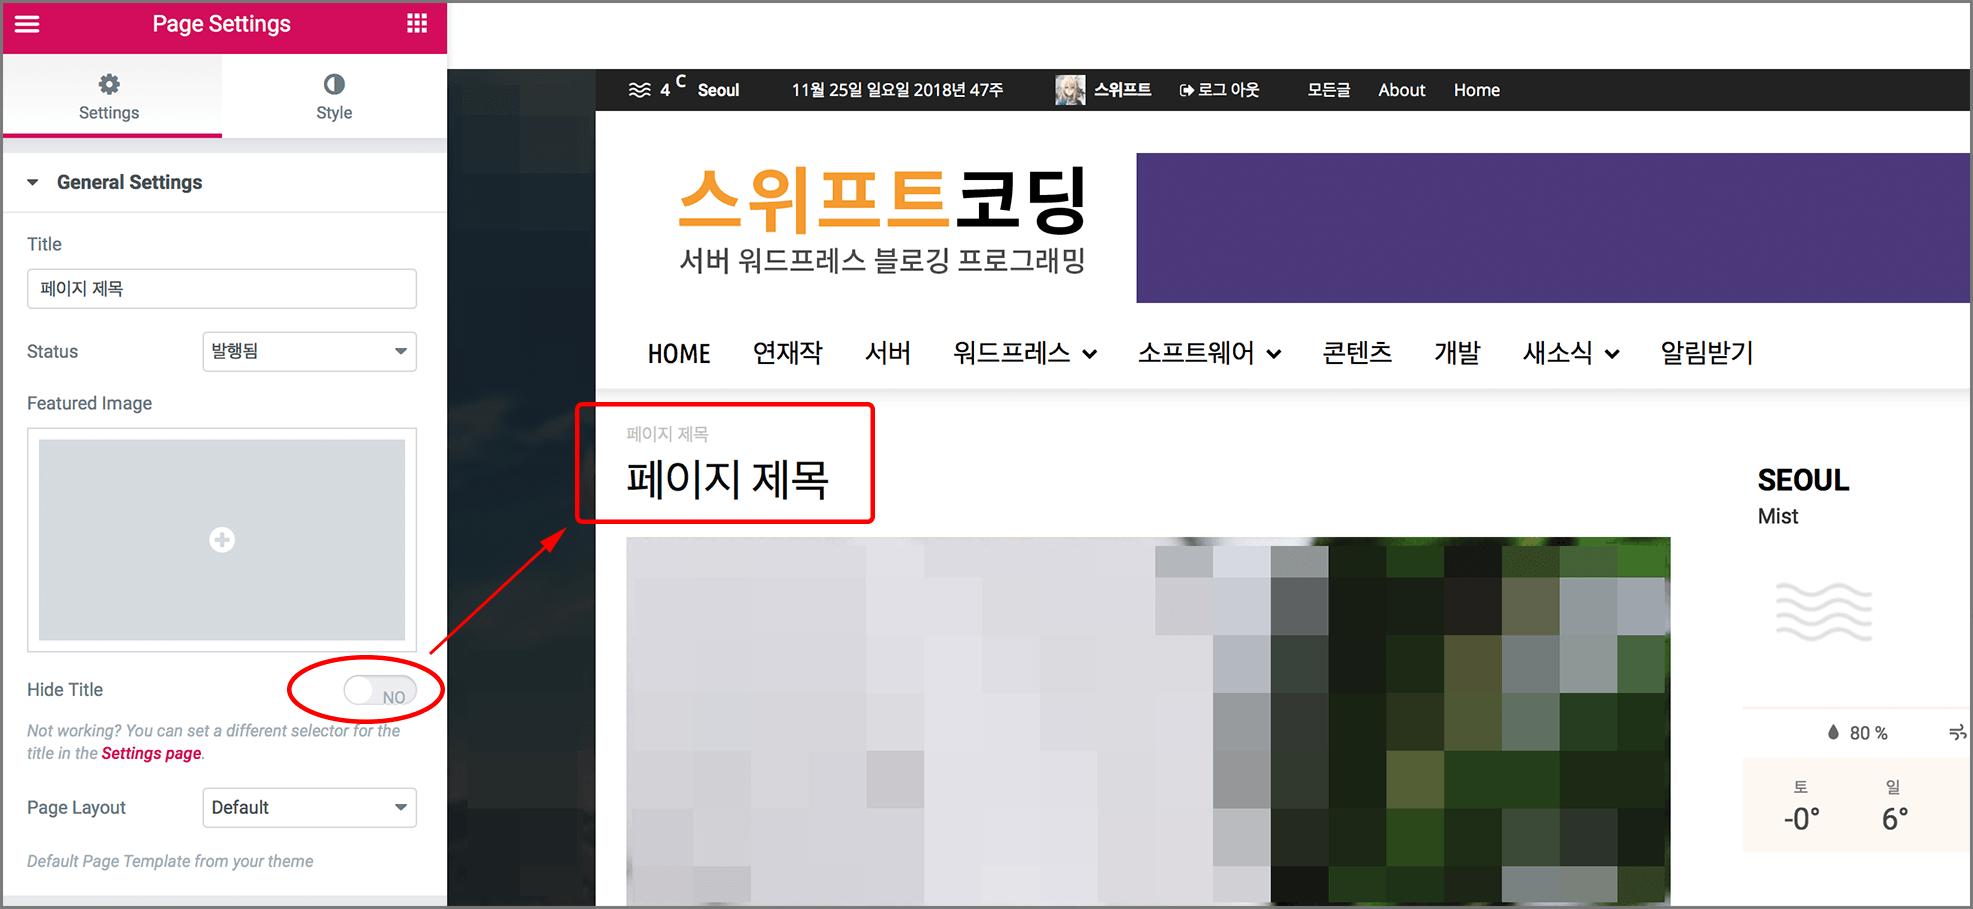 hide title 옵션이 꺼져있어서 페이지 제목이 나타나는 디폴트 템플릿